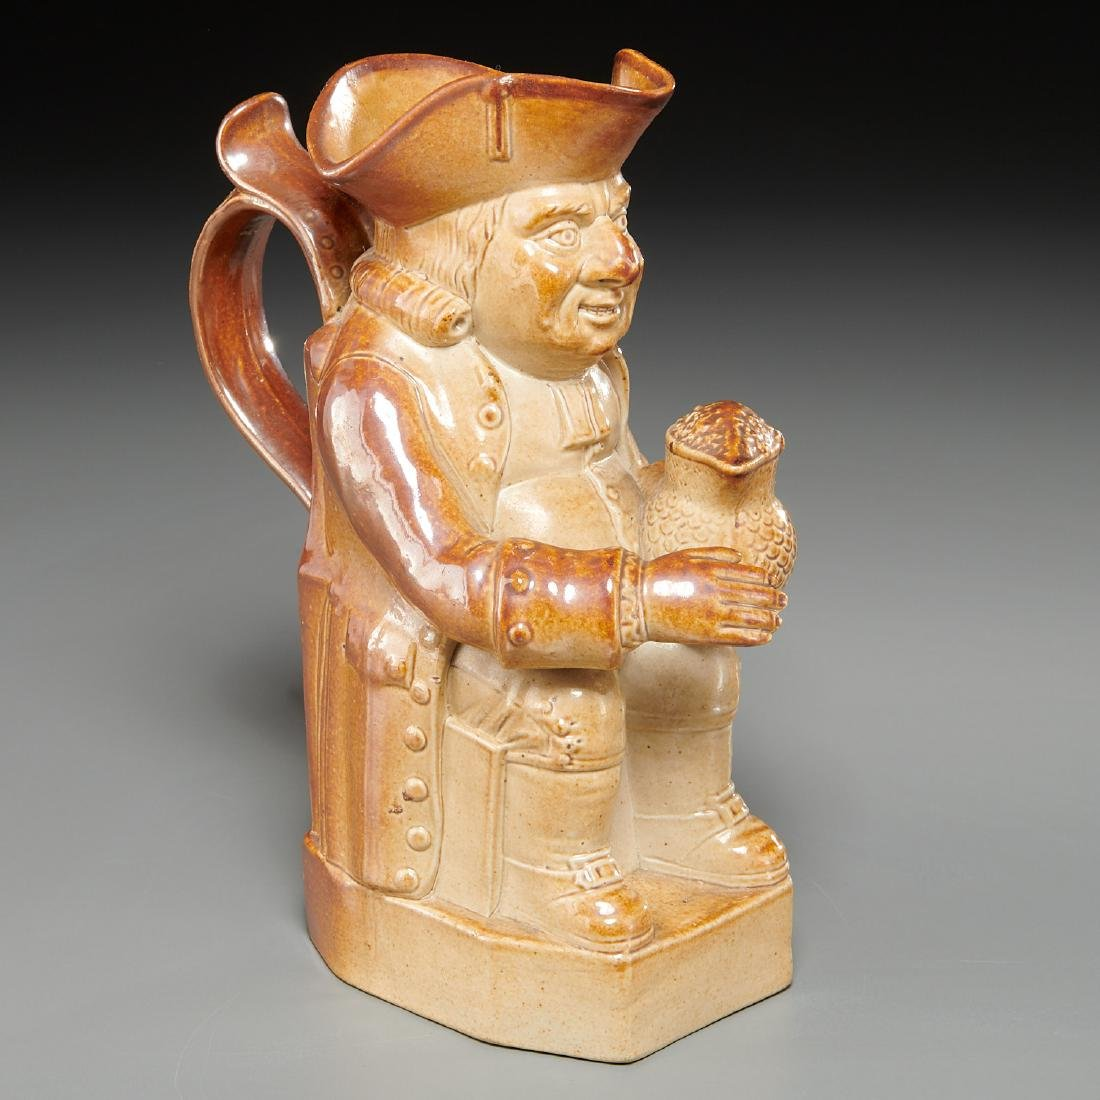 English stoneware Toby jug, c. 1800's